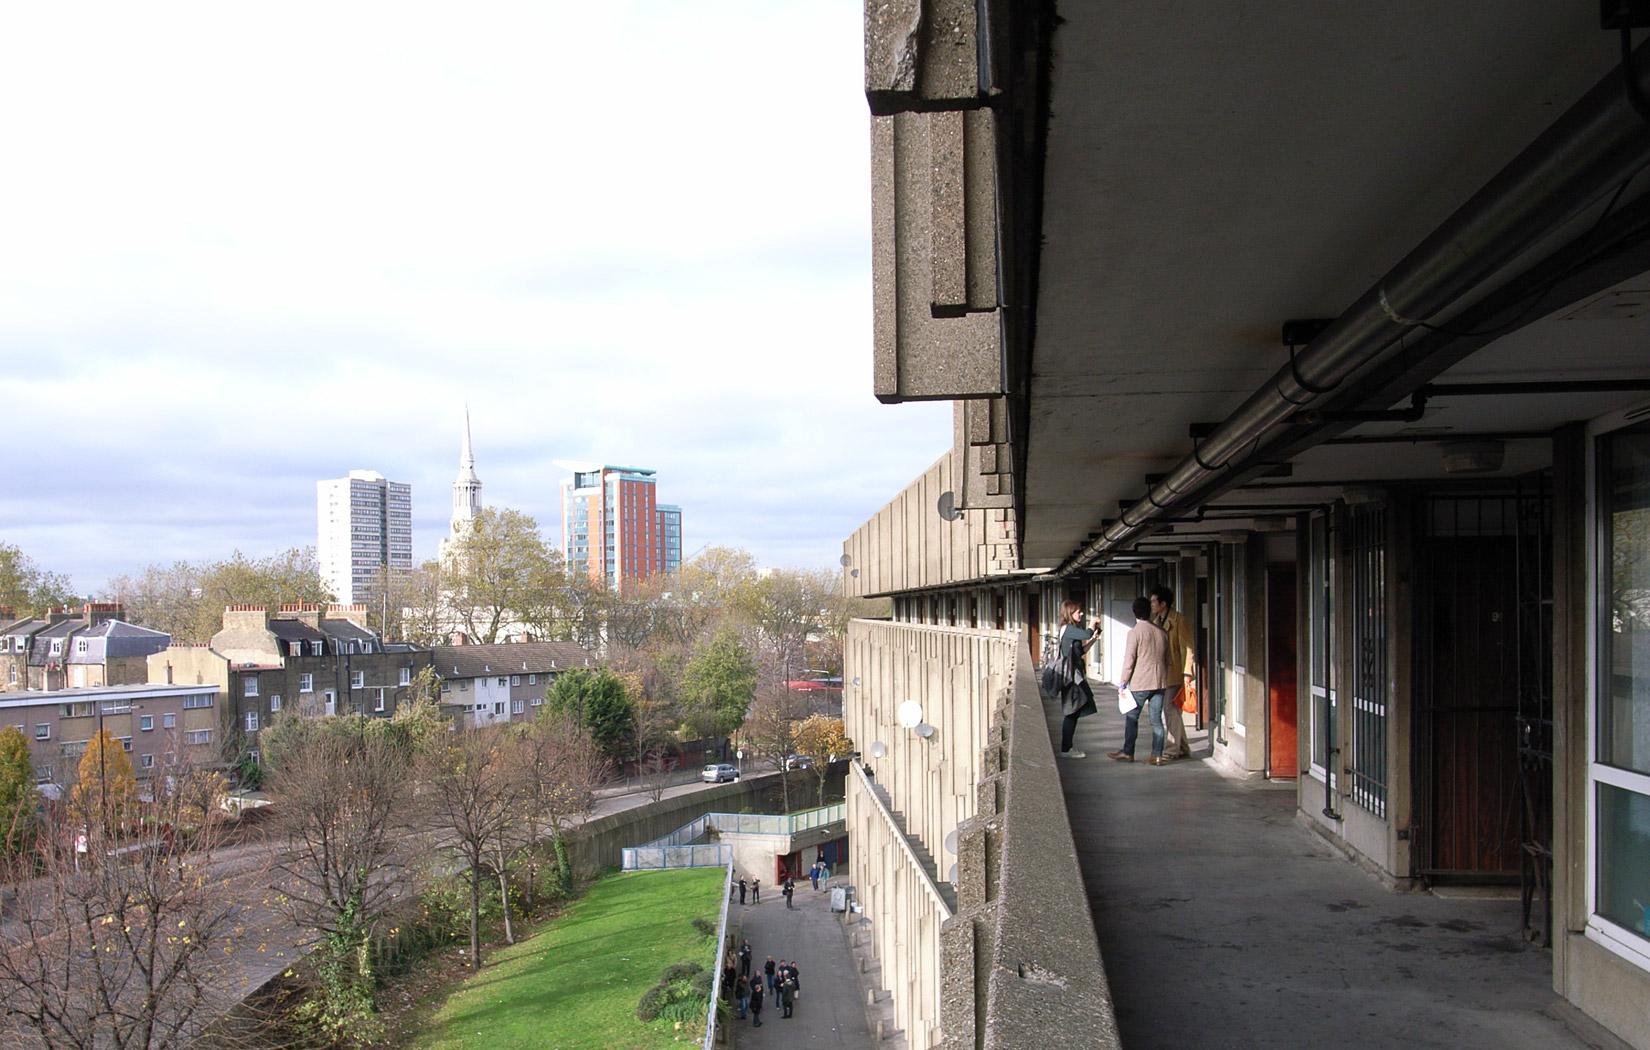 Robin-Hood-Gardens-Steve-Cadman-balconies